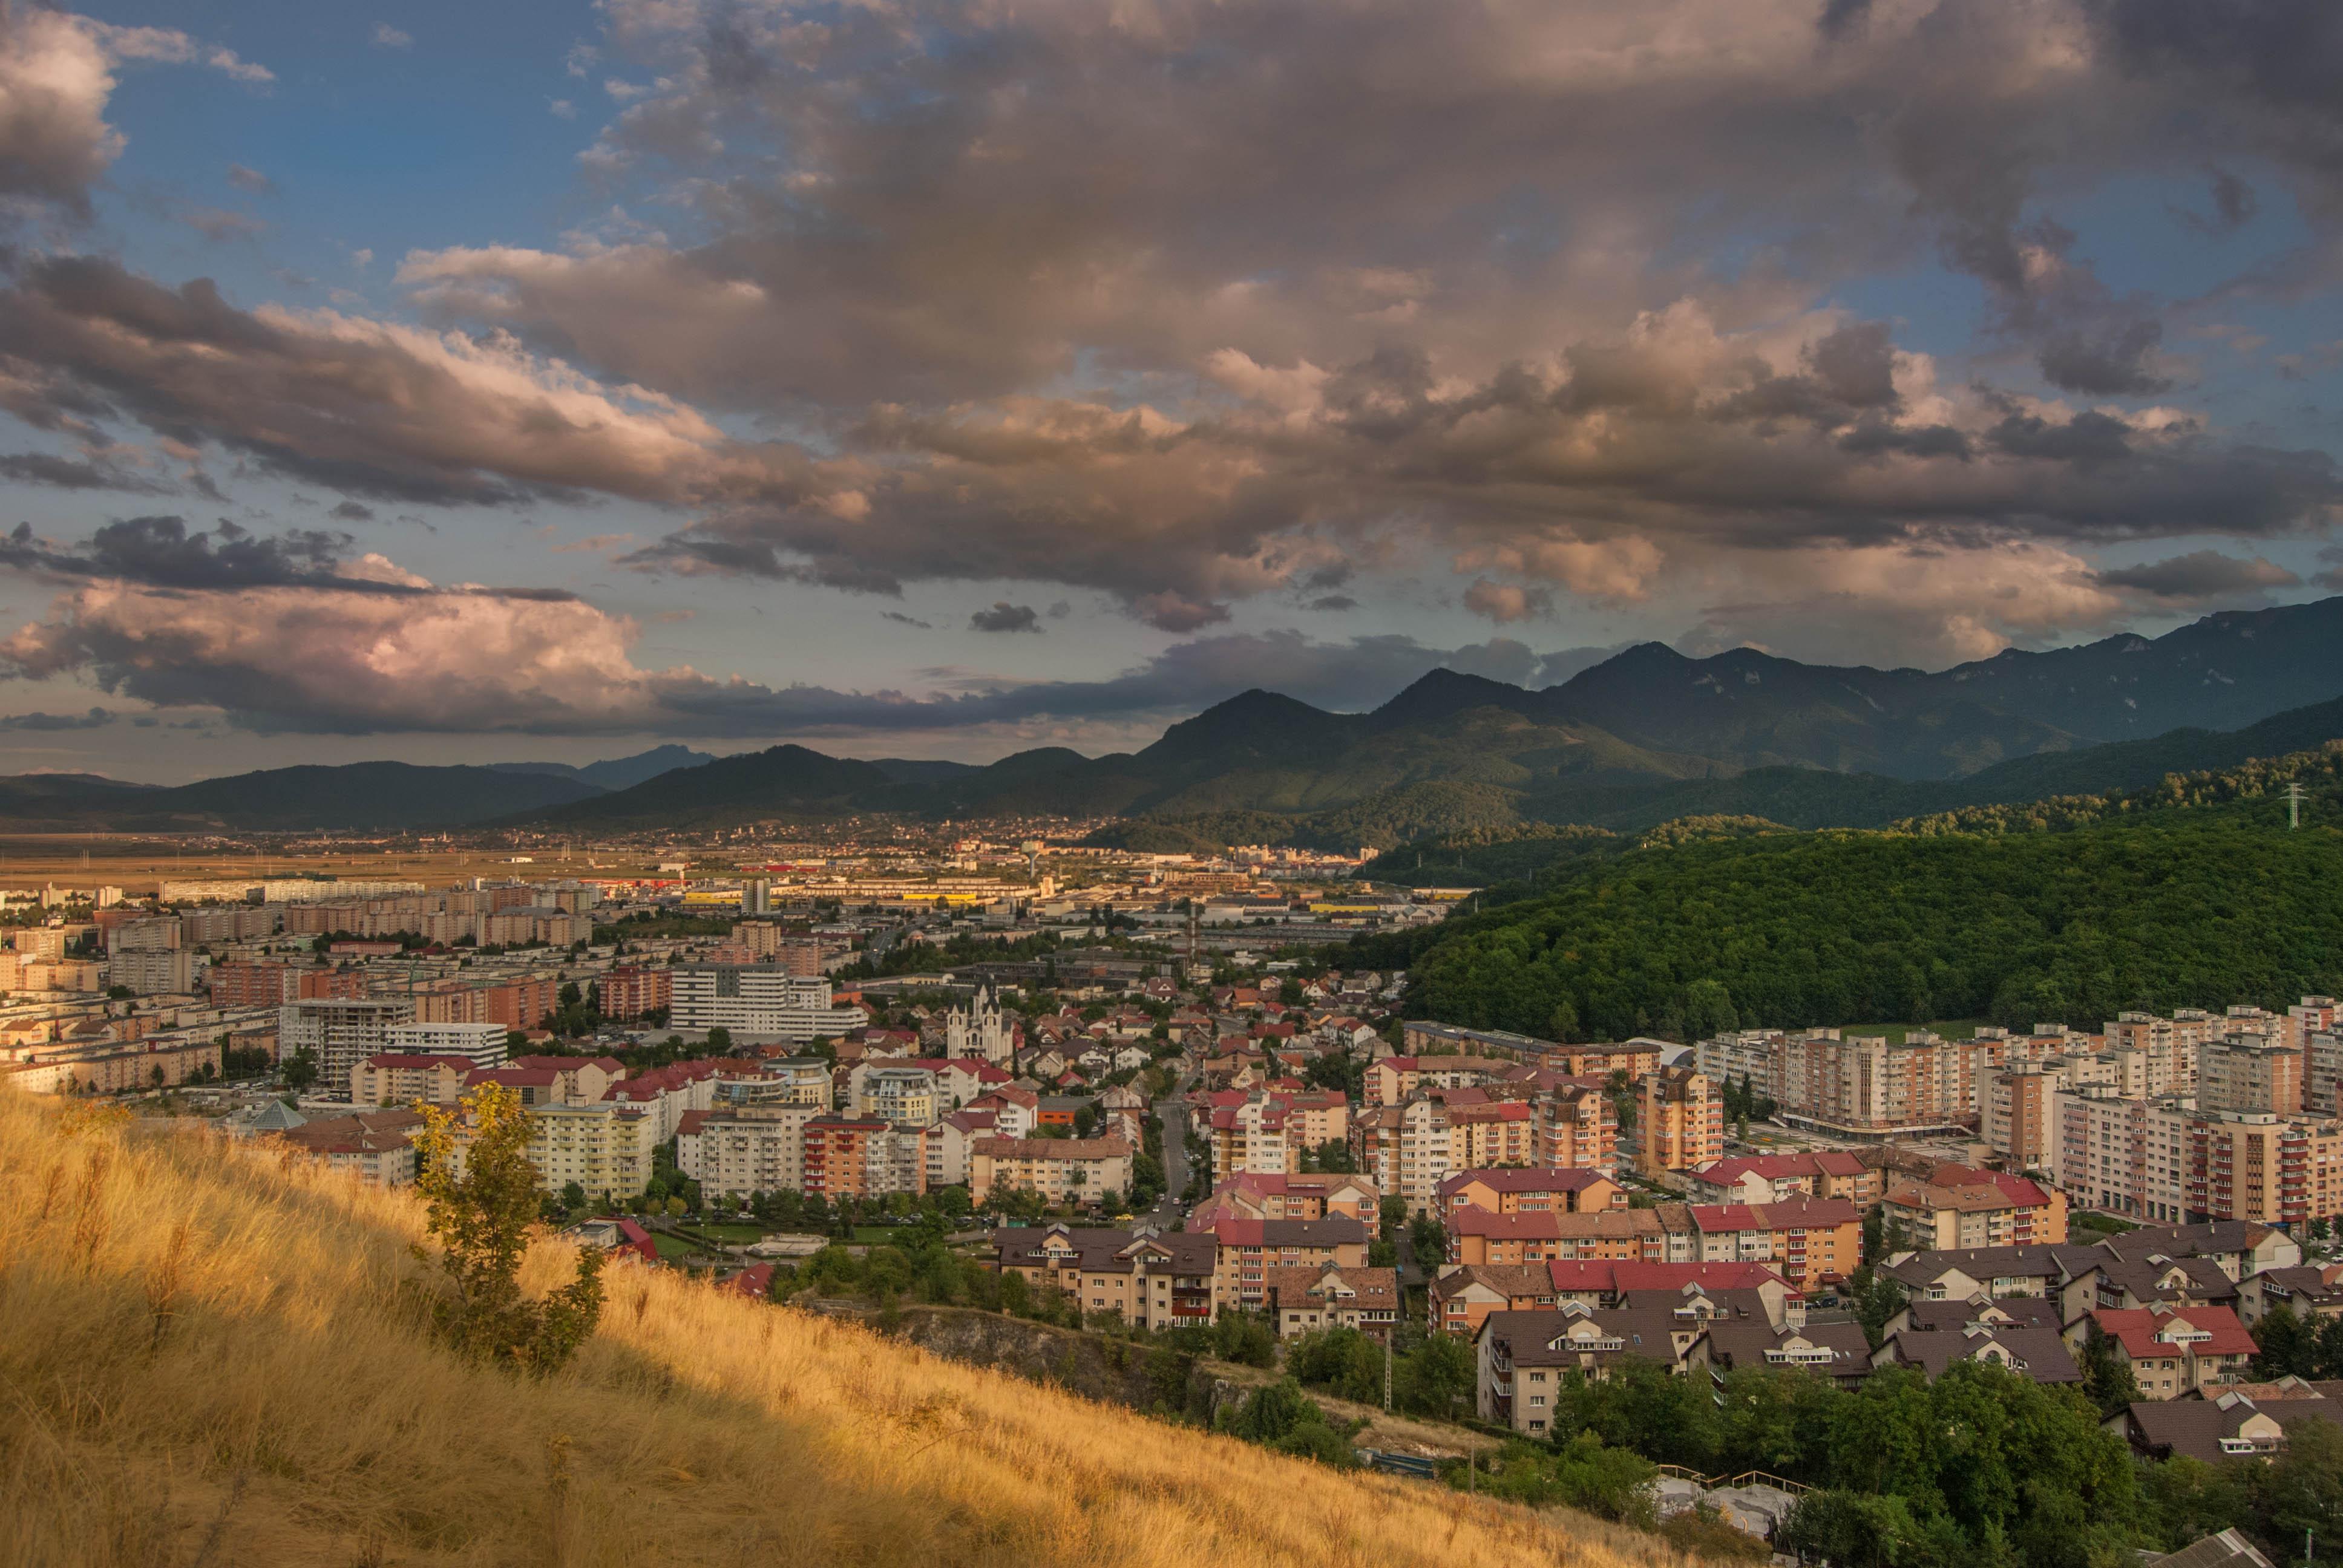 Fotograf de Brașov, am un nume: Alexandru Bulgariu